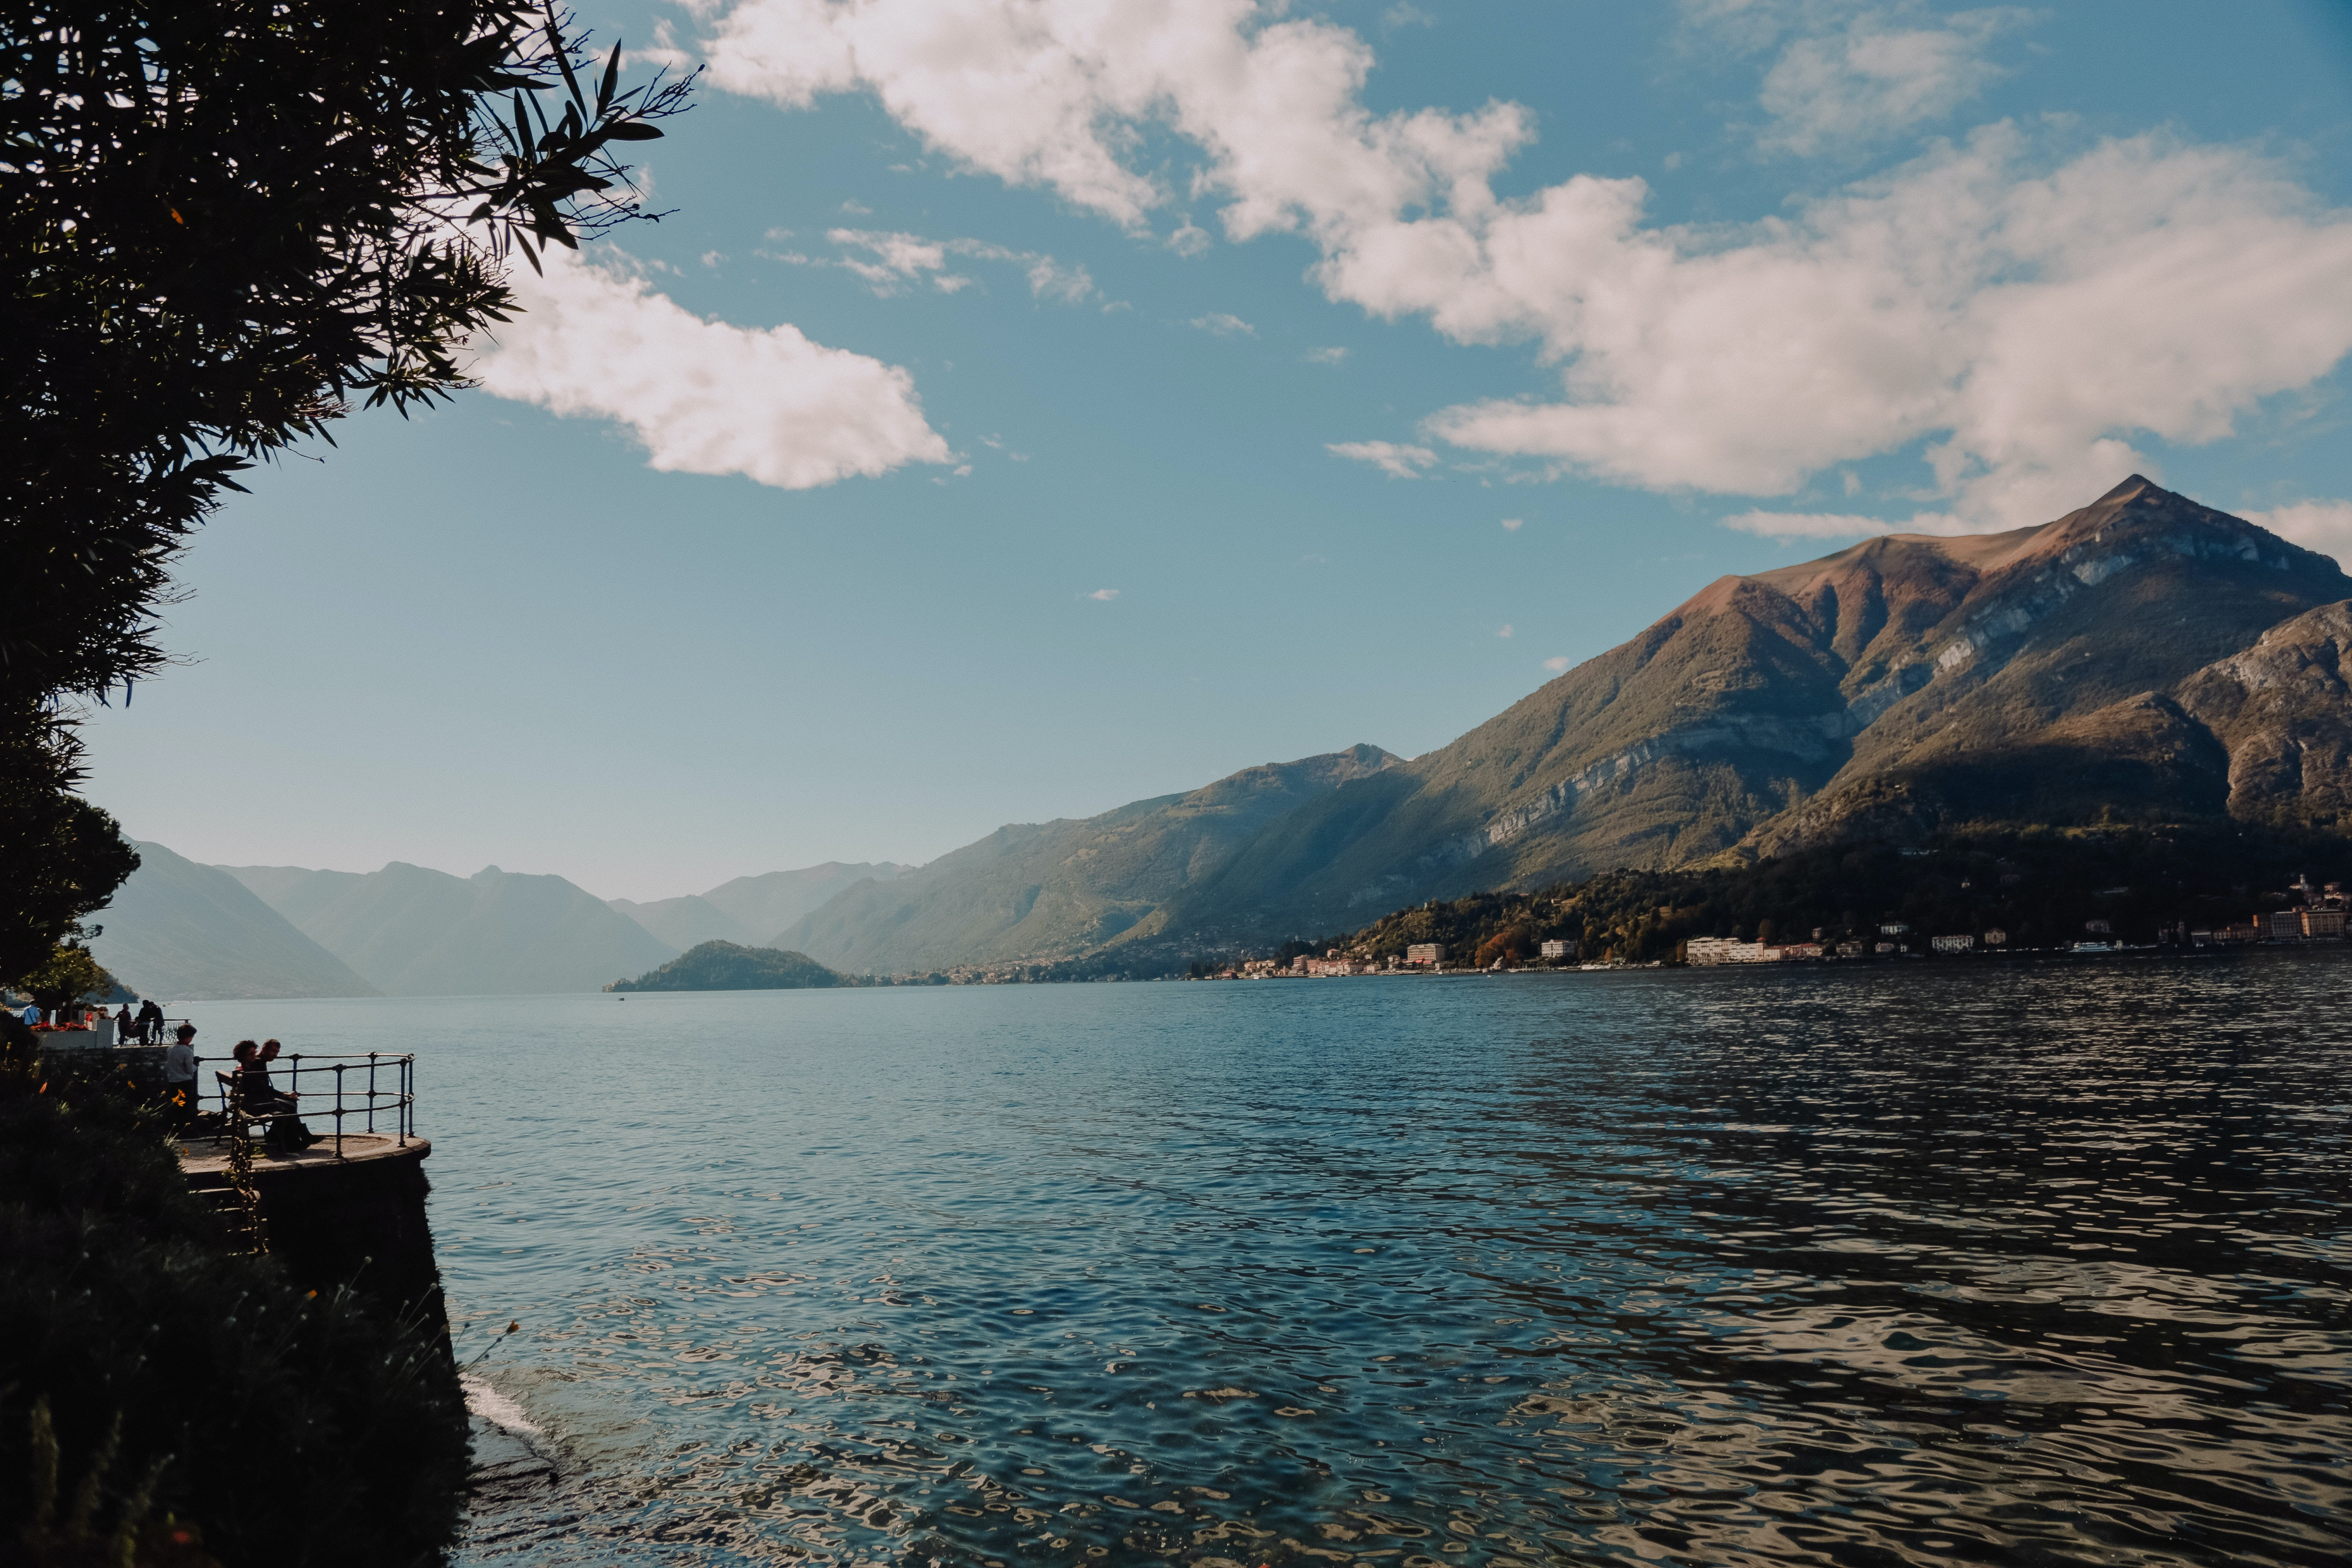 Lake Como, Italy, Honeymoon in Italy Tour Guide